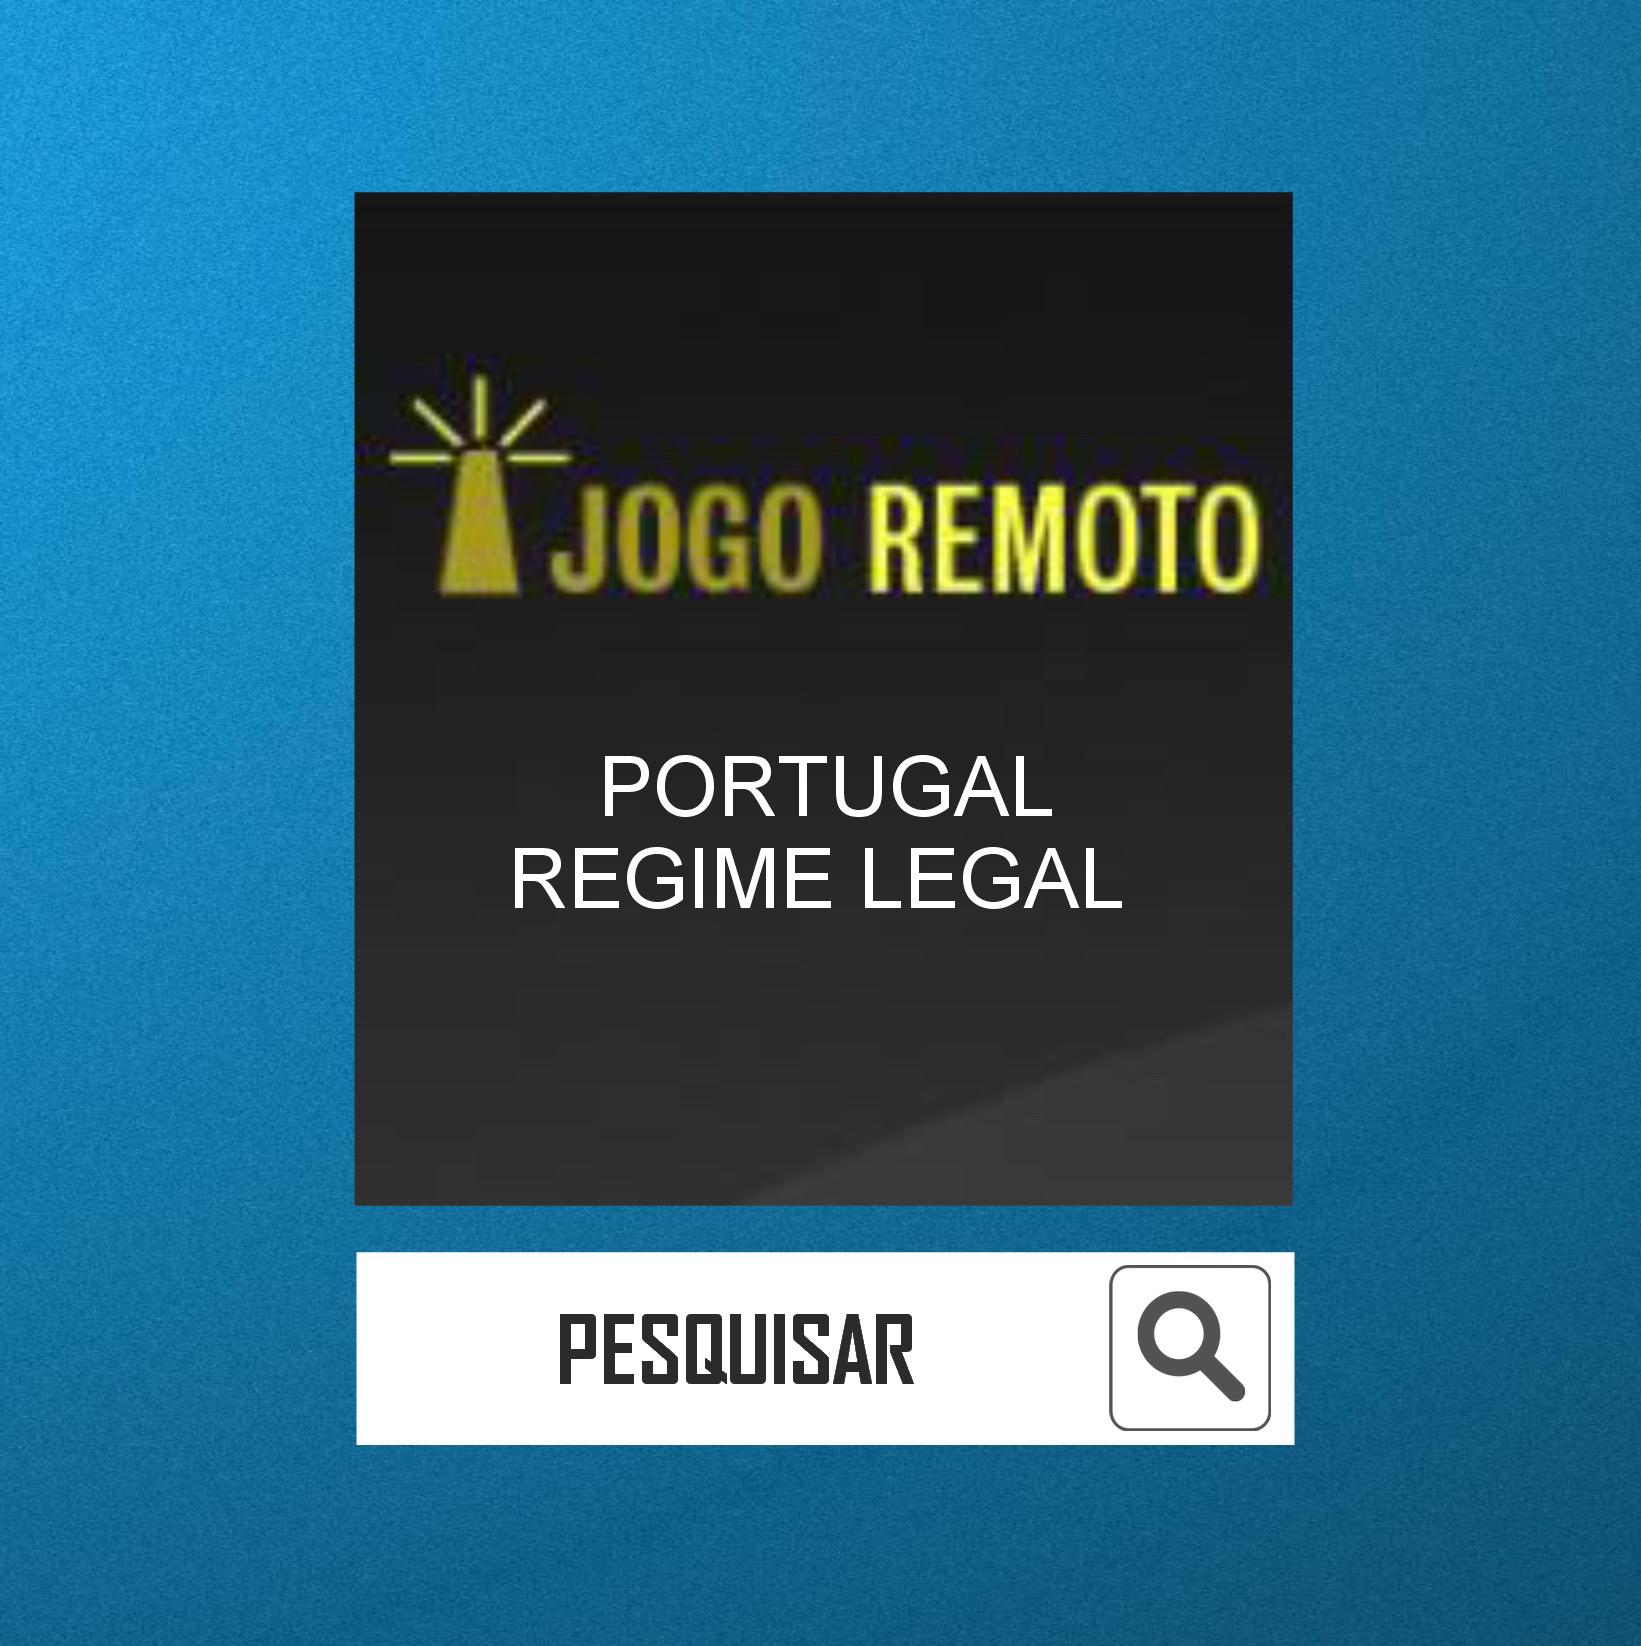 0 PORTUGAL - REGIME LEGAL